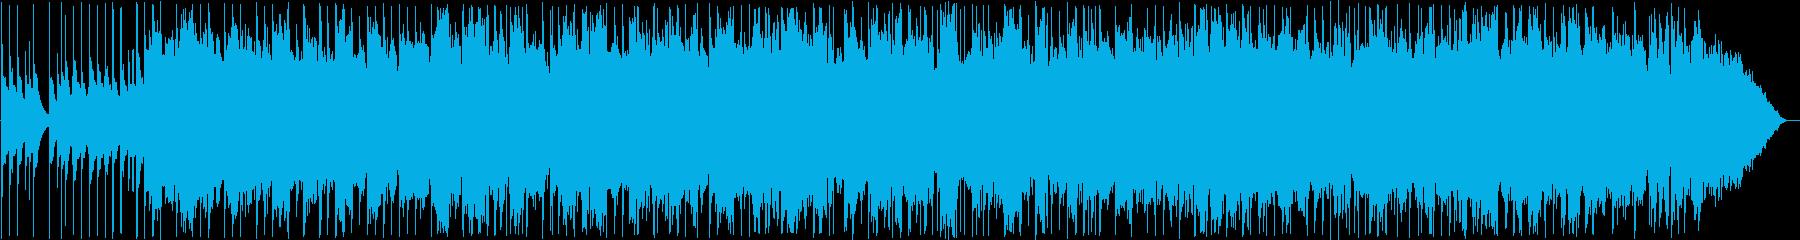 Yasuya Yunta / Okinawan folk song's reproduced waveform